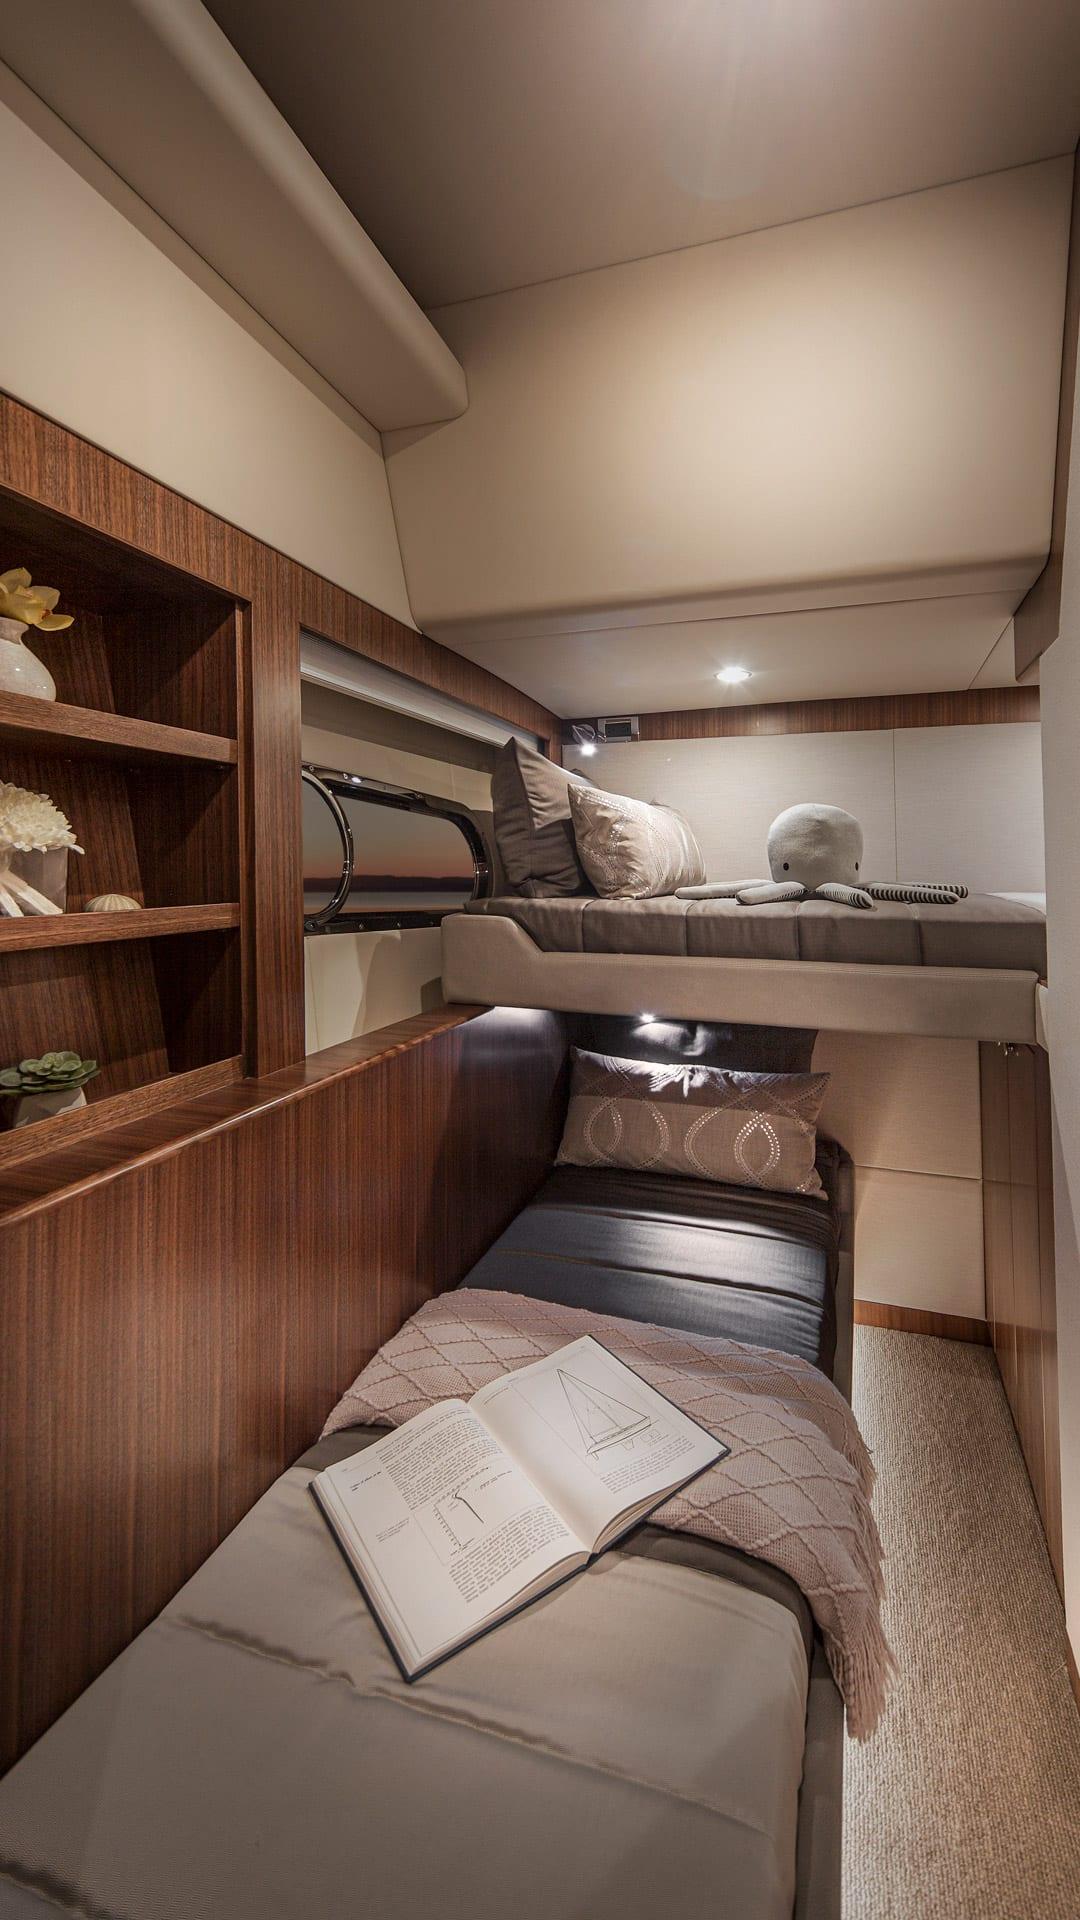 Belize 66 Daybridge Starboard Stateroom 01 – Satin Walnut Timber Finish